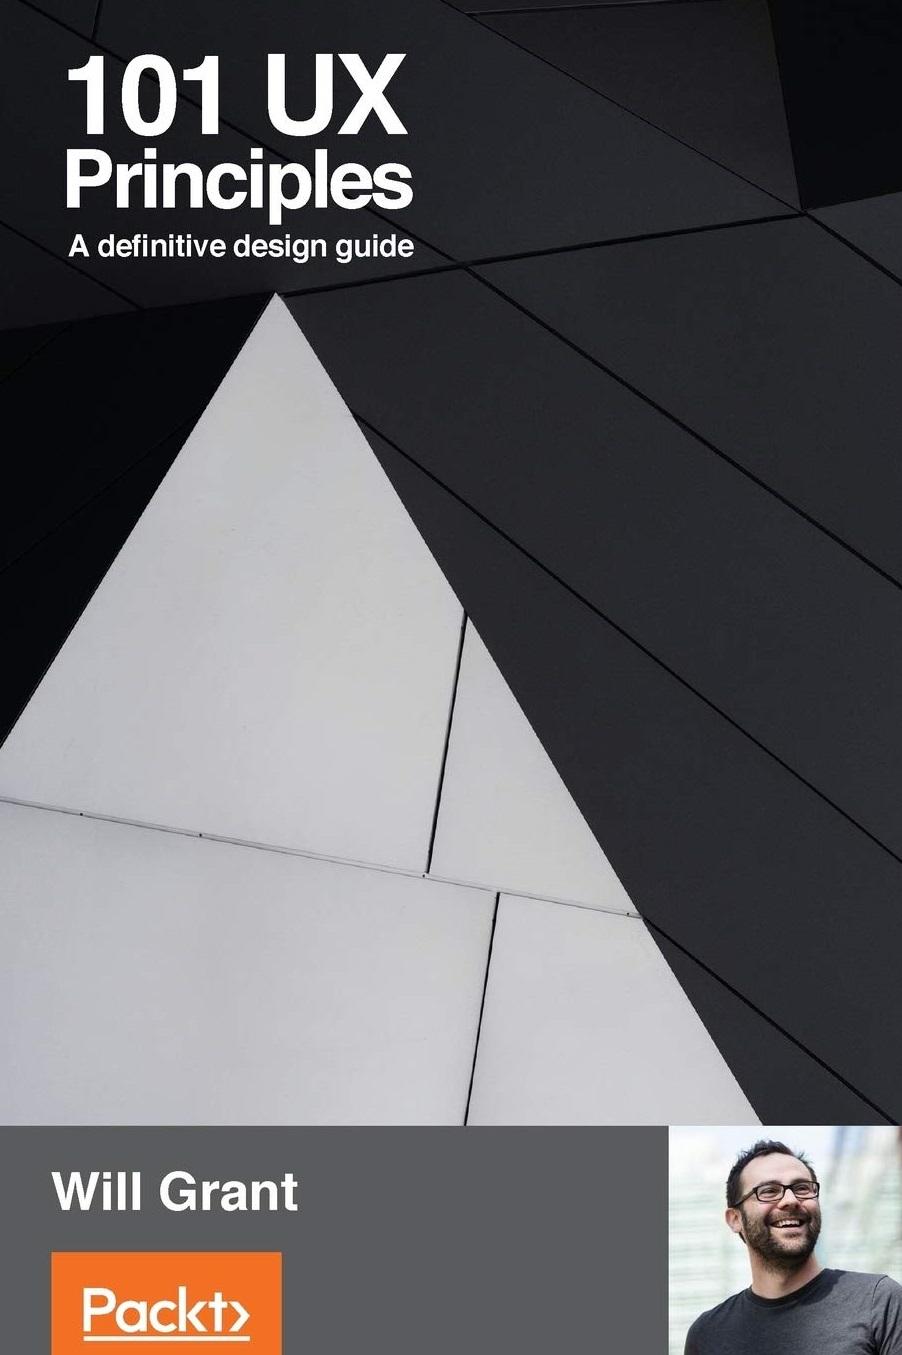 101 UX Principles A Definitive Design Guide 2018 Edition